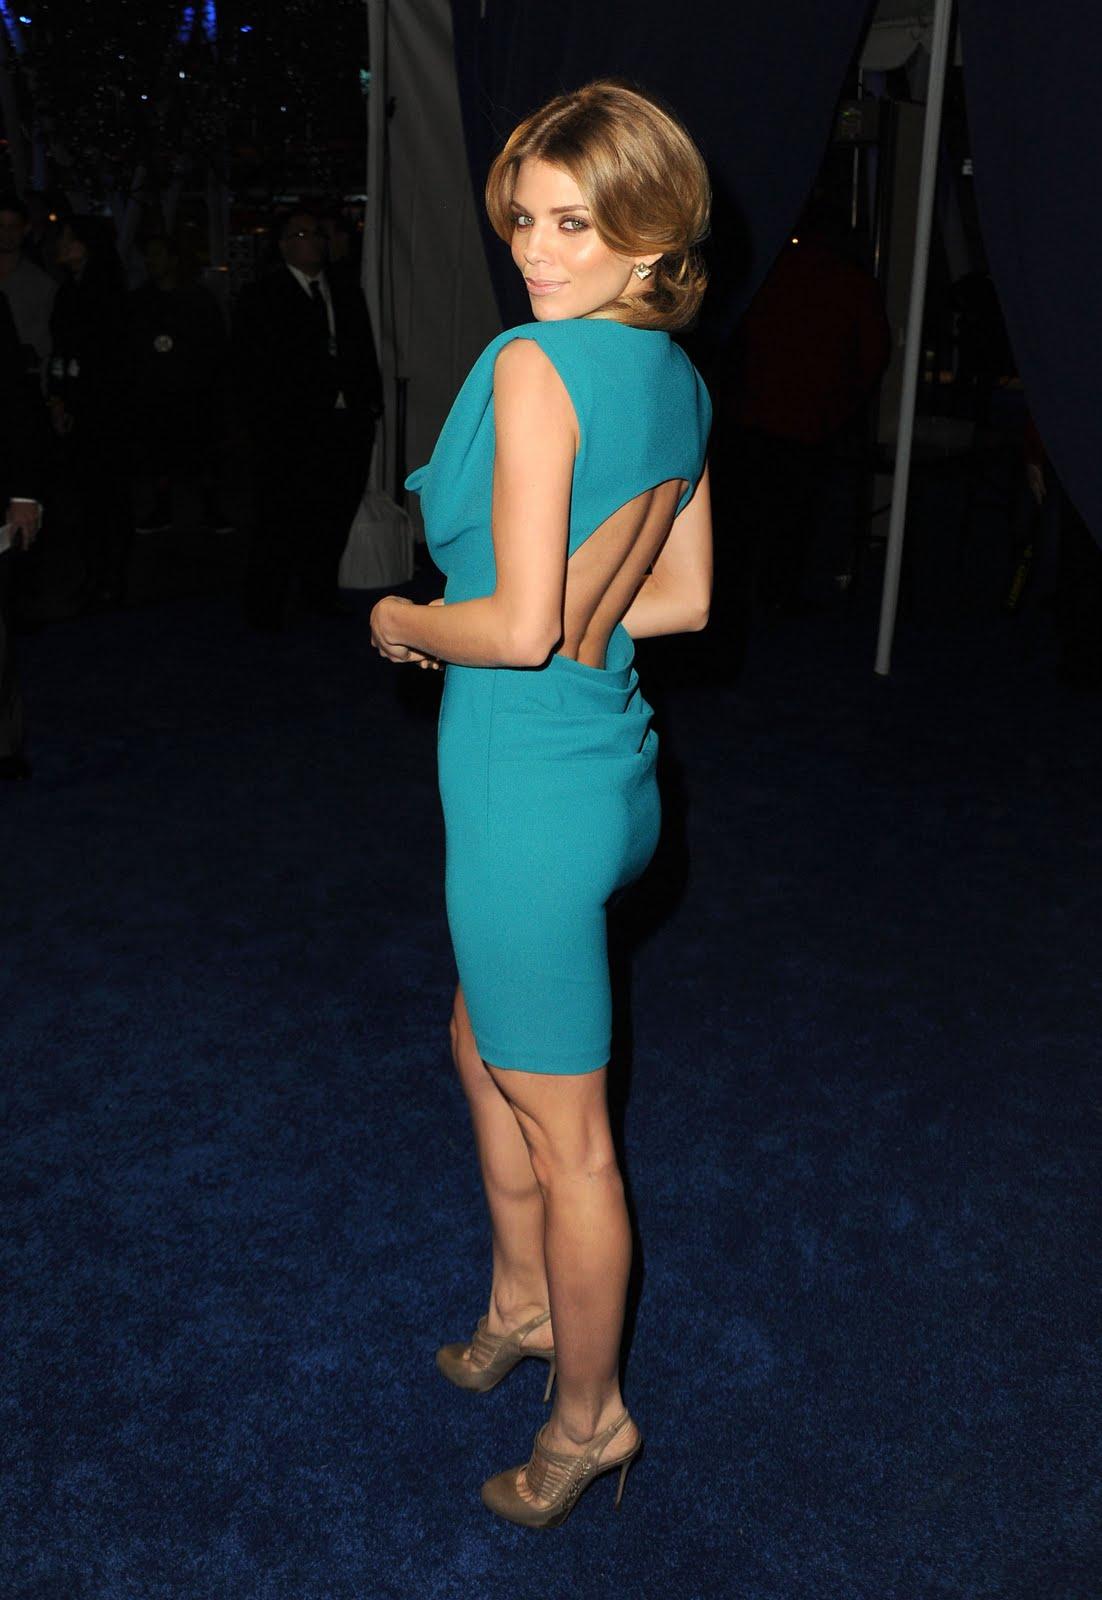 http://3.bp.blogspot.com/-S_92zF2Vgyg/TW6YMM9inoI/AAAAAAAAGf0/kMbm92s6POg/s1600/AnnaLynne_McCord_2011_Peoples_Choice_Awards_055_122_1129lo.jpg